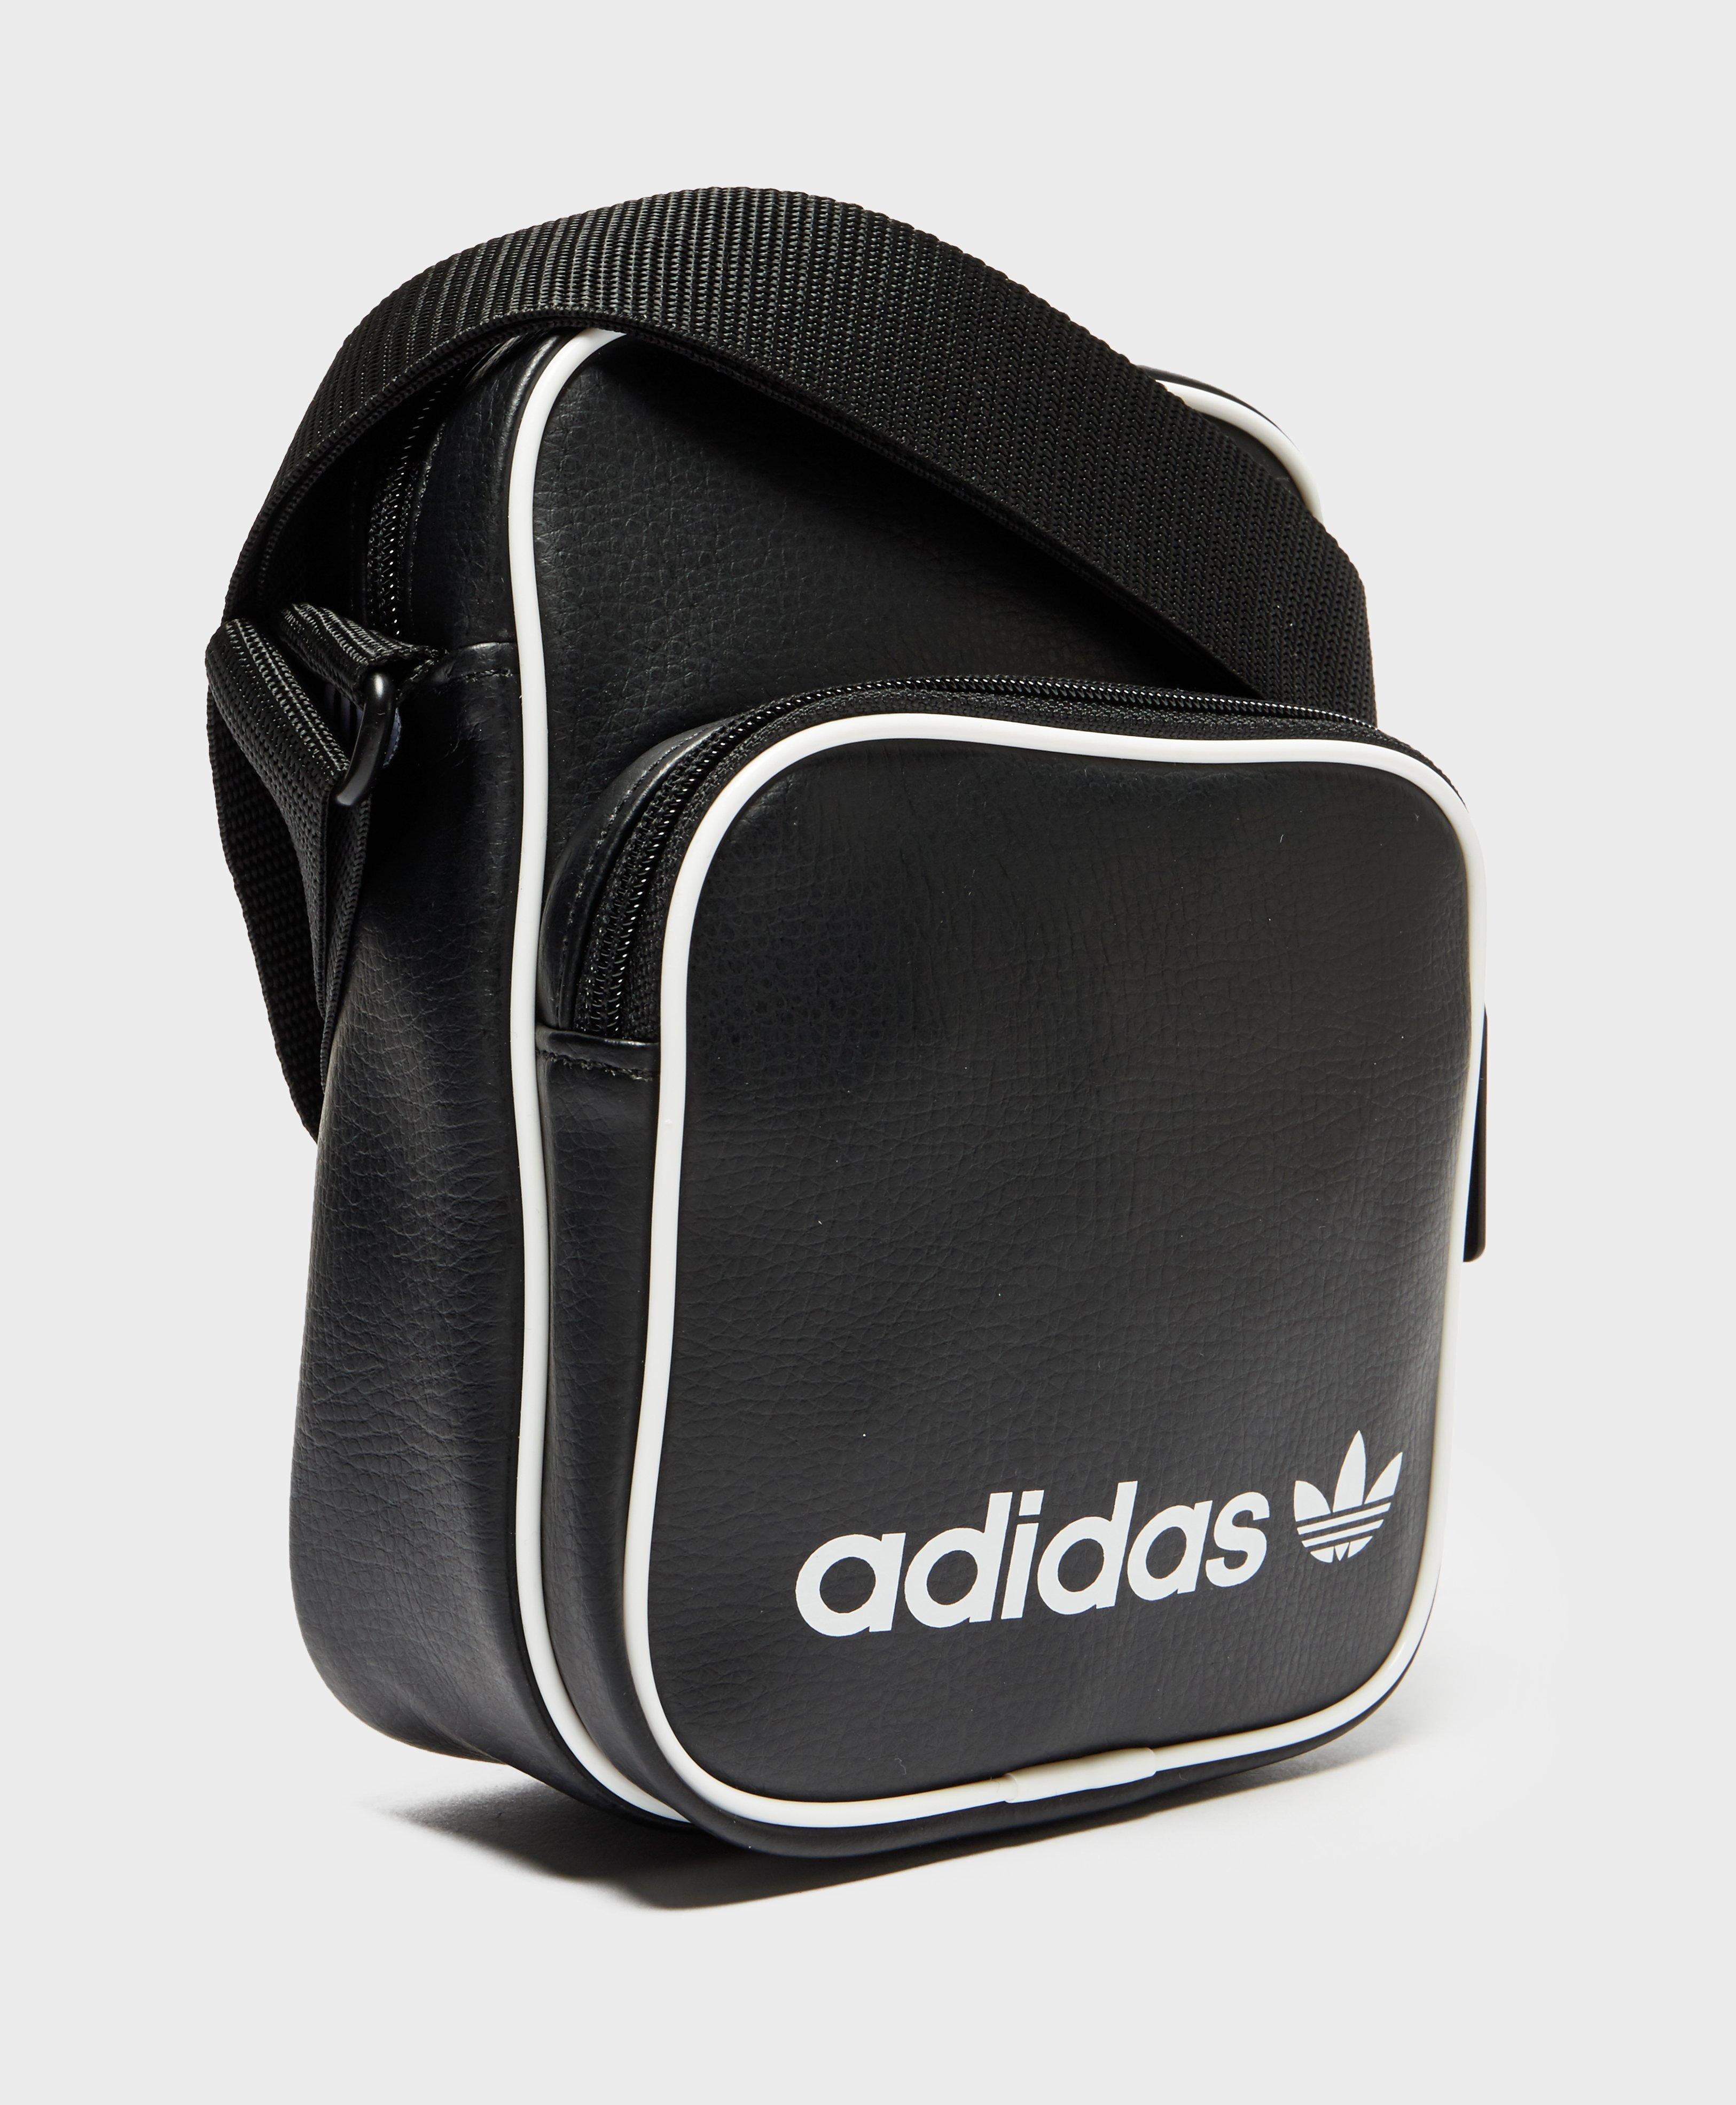 e0e434bb198 adidas Originals Cross Body Bag - Online Exclusive in Black for Men ...